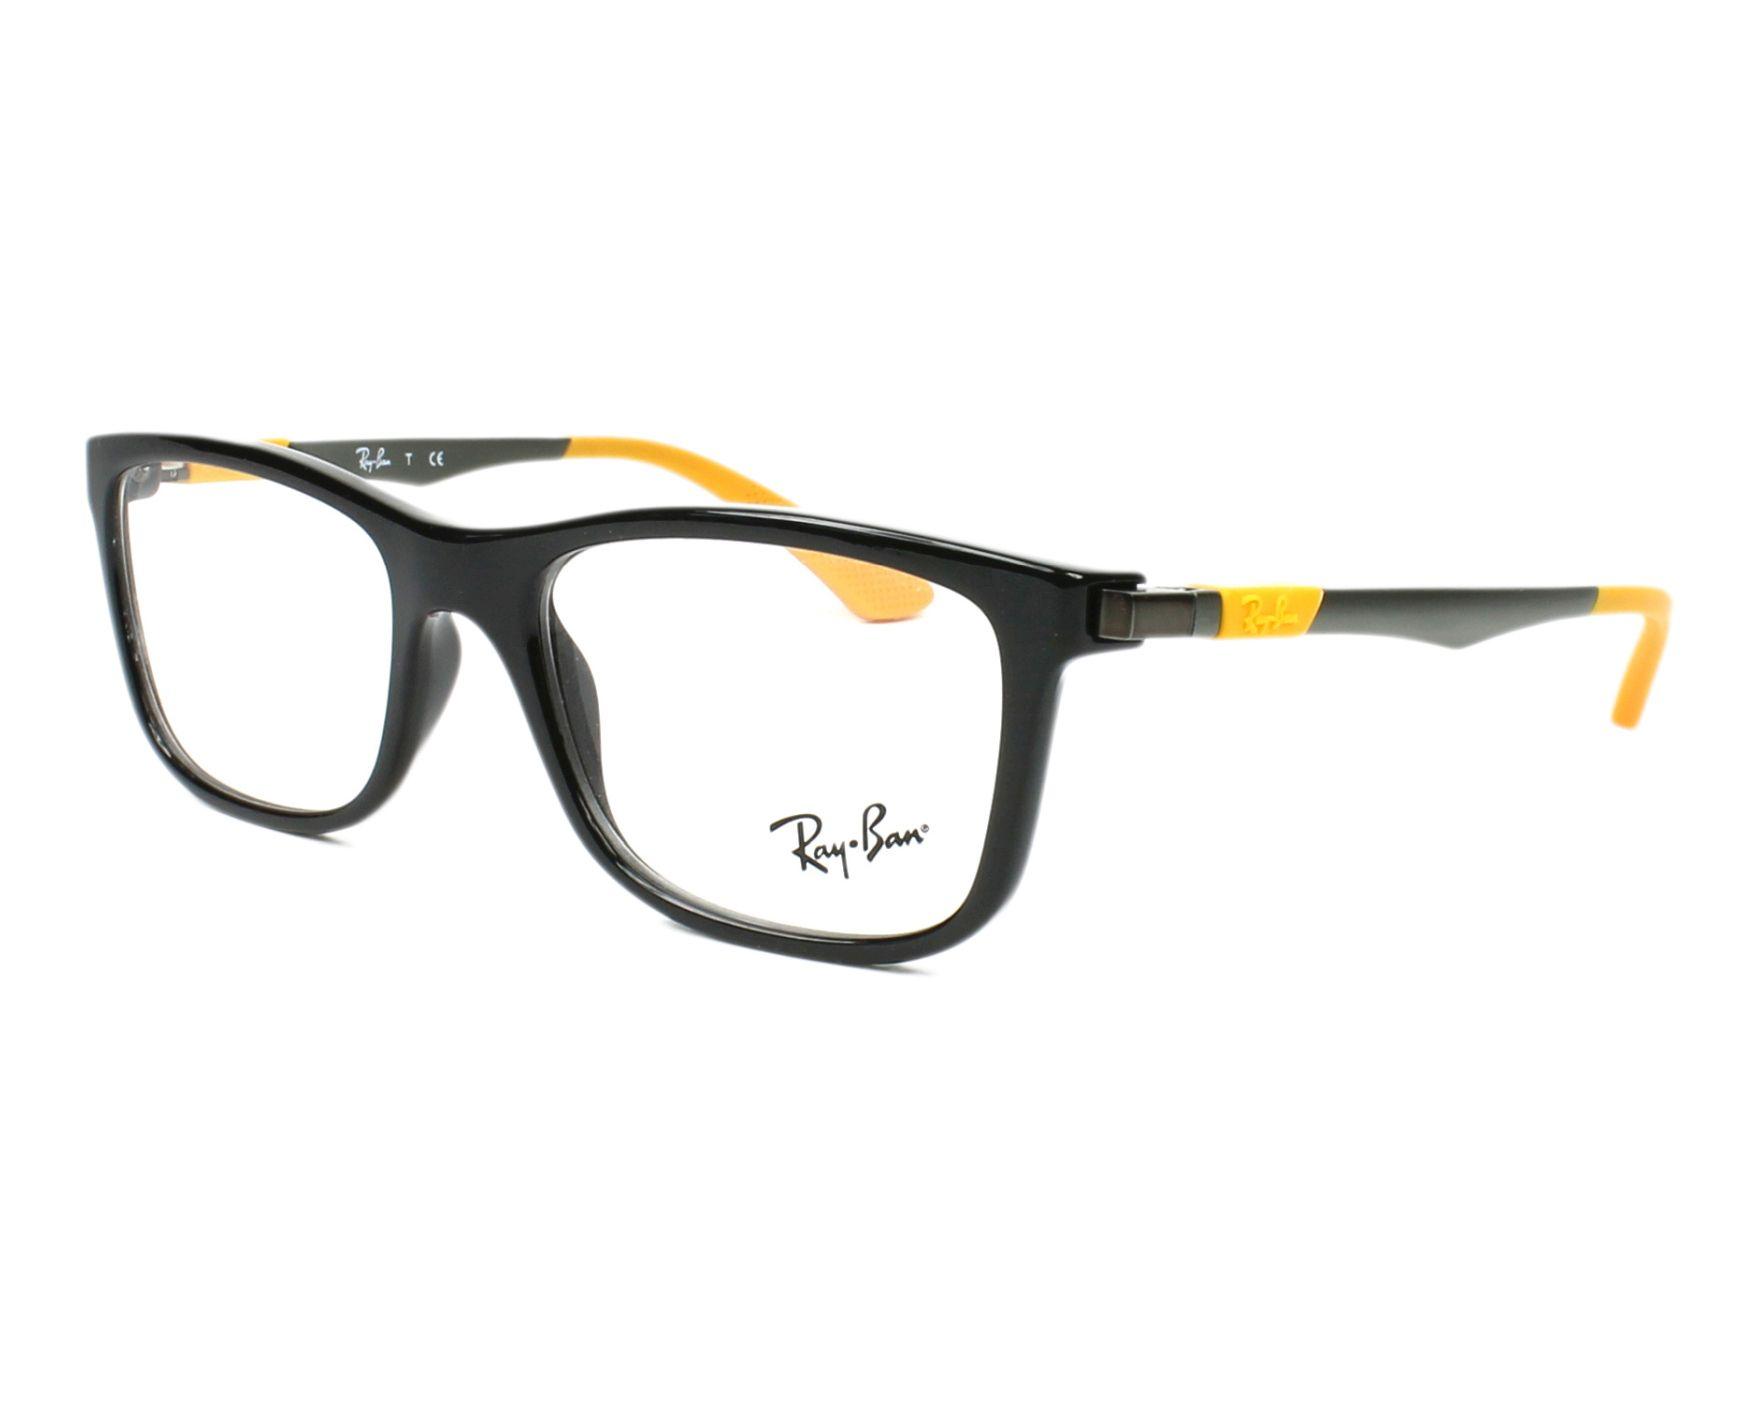 6d013cde50d8fa Brillen Ray-Ban RY-1549 3733 - schwarz braun Profilansicht